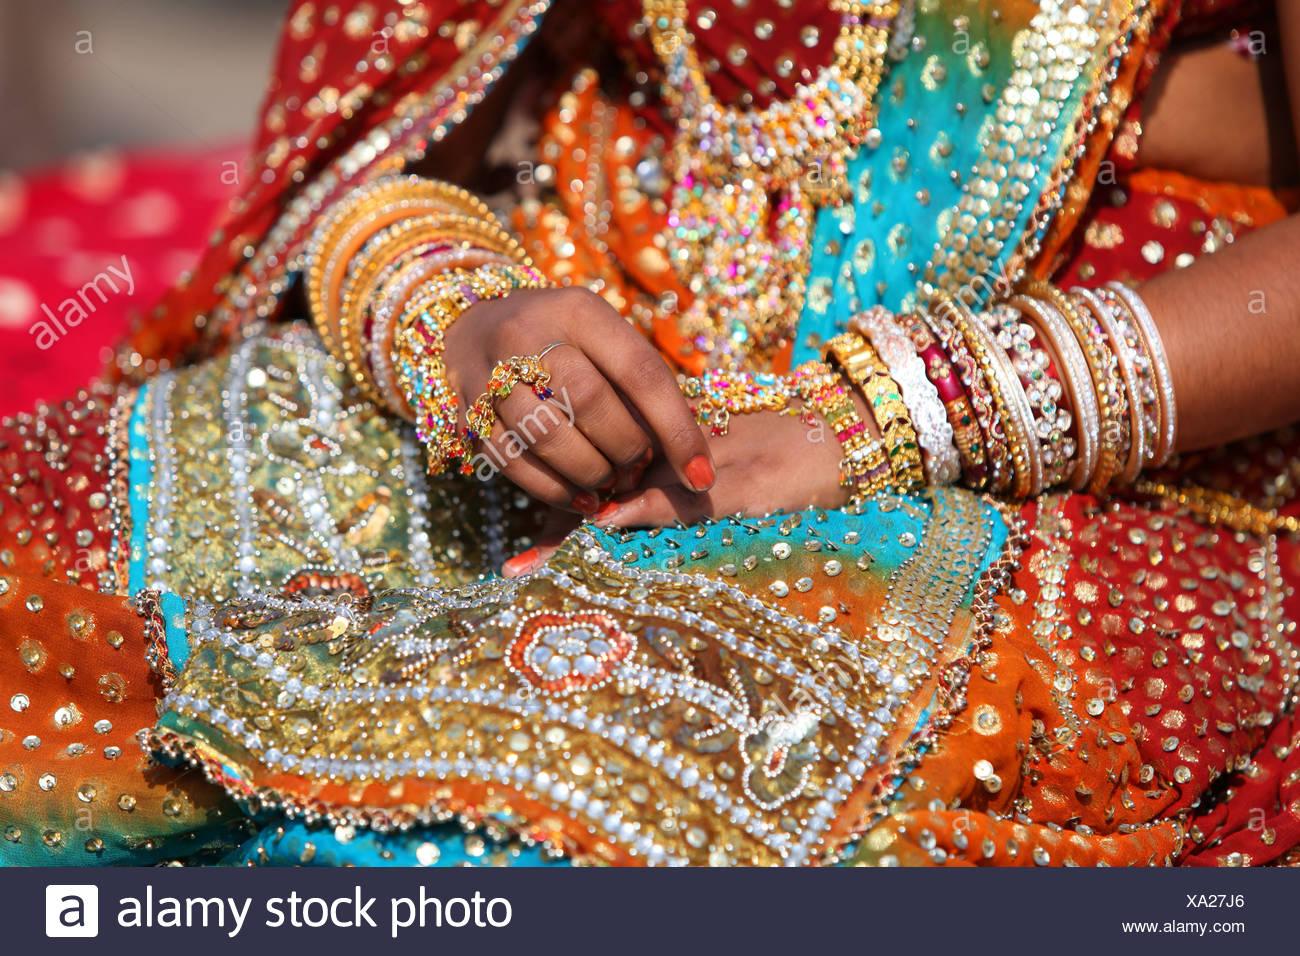 Jaisalmer, dessert festival, festival, sari, jewellery, festively, woman, girl, wedding, decorated, decoration, party, fête, cel - Stock Image